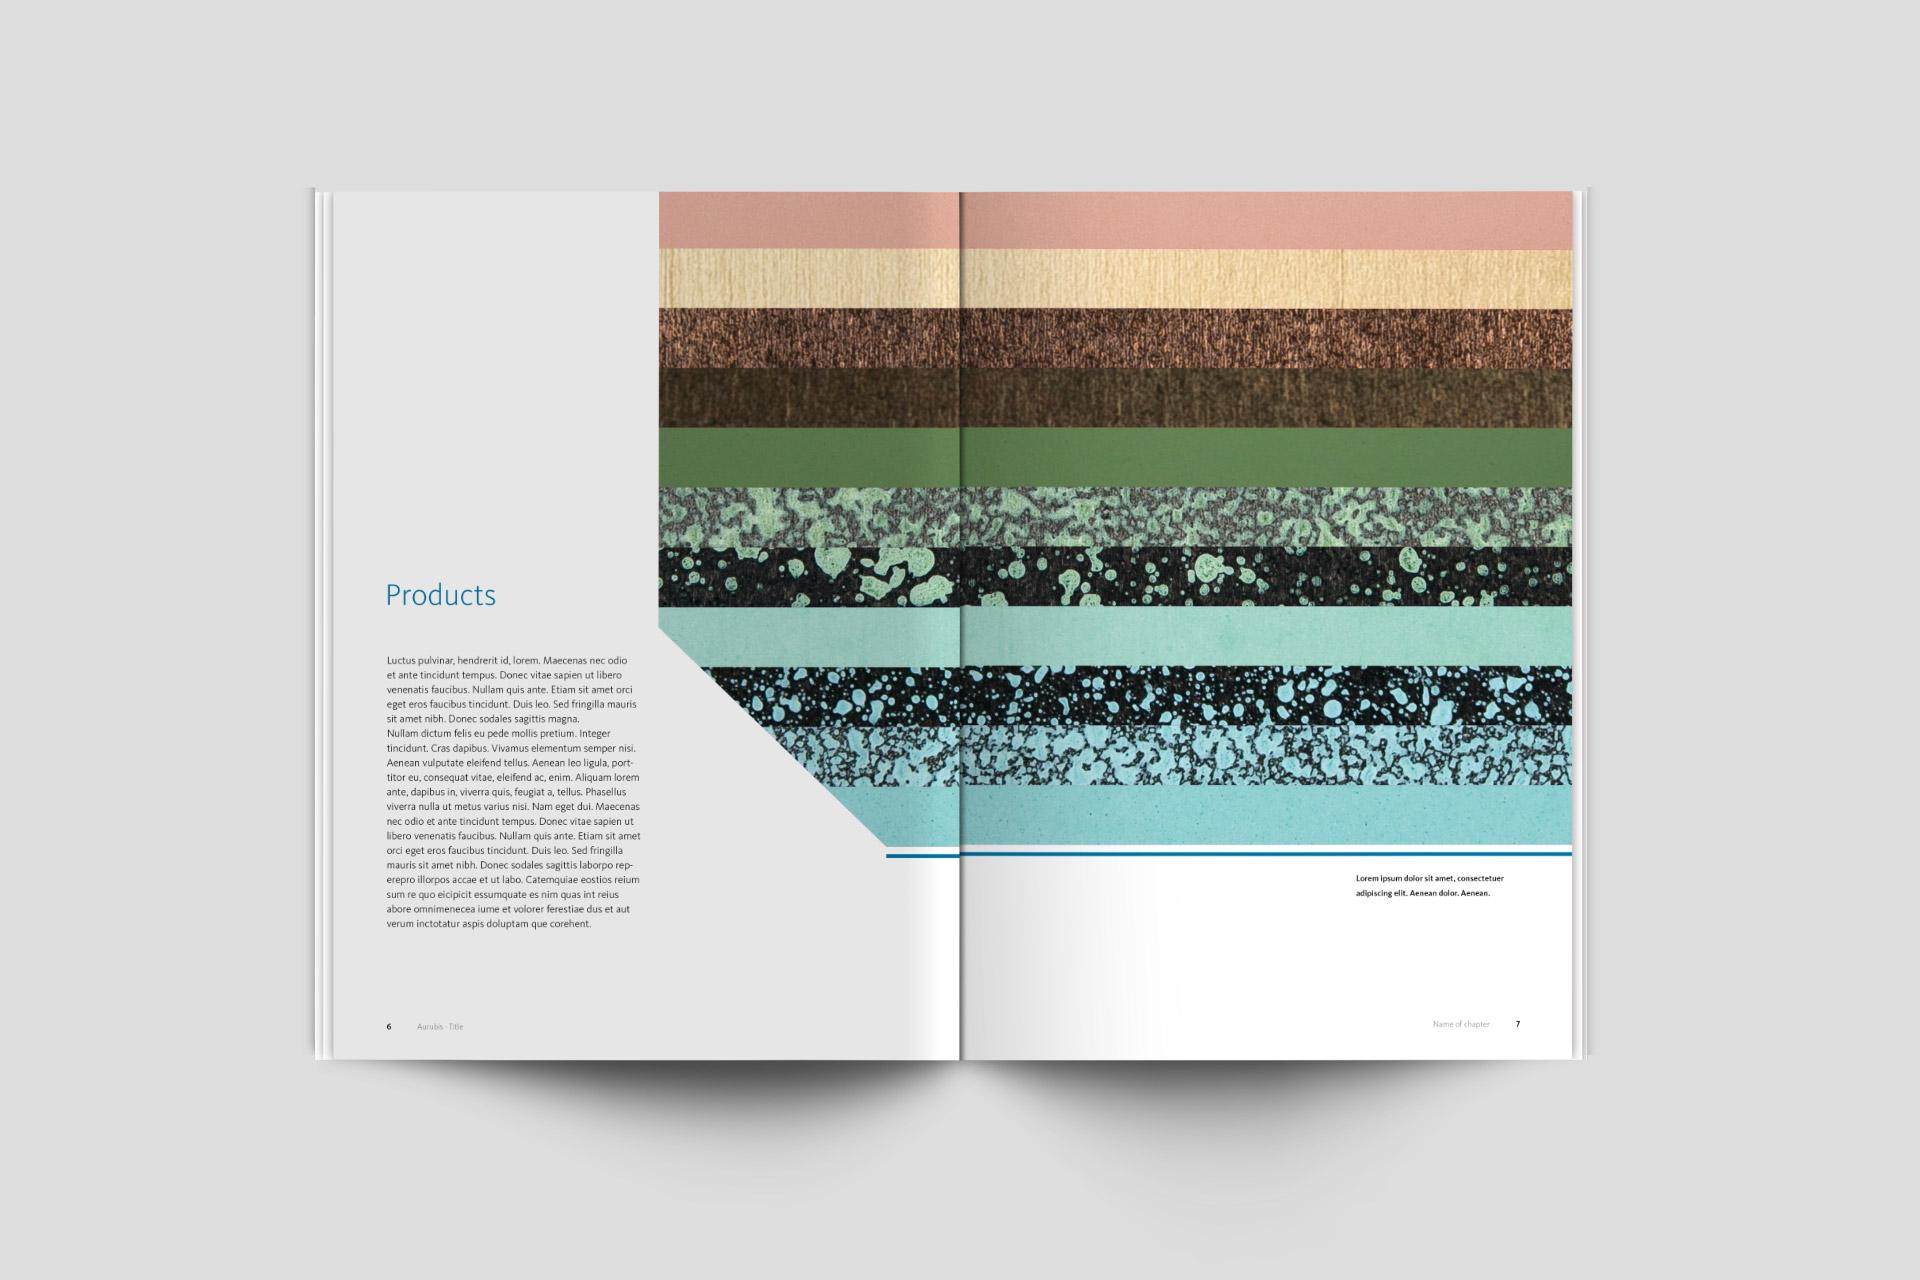 aurubis-nordic-copper broschuerendesign